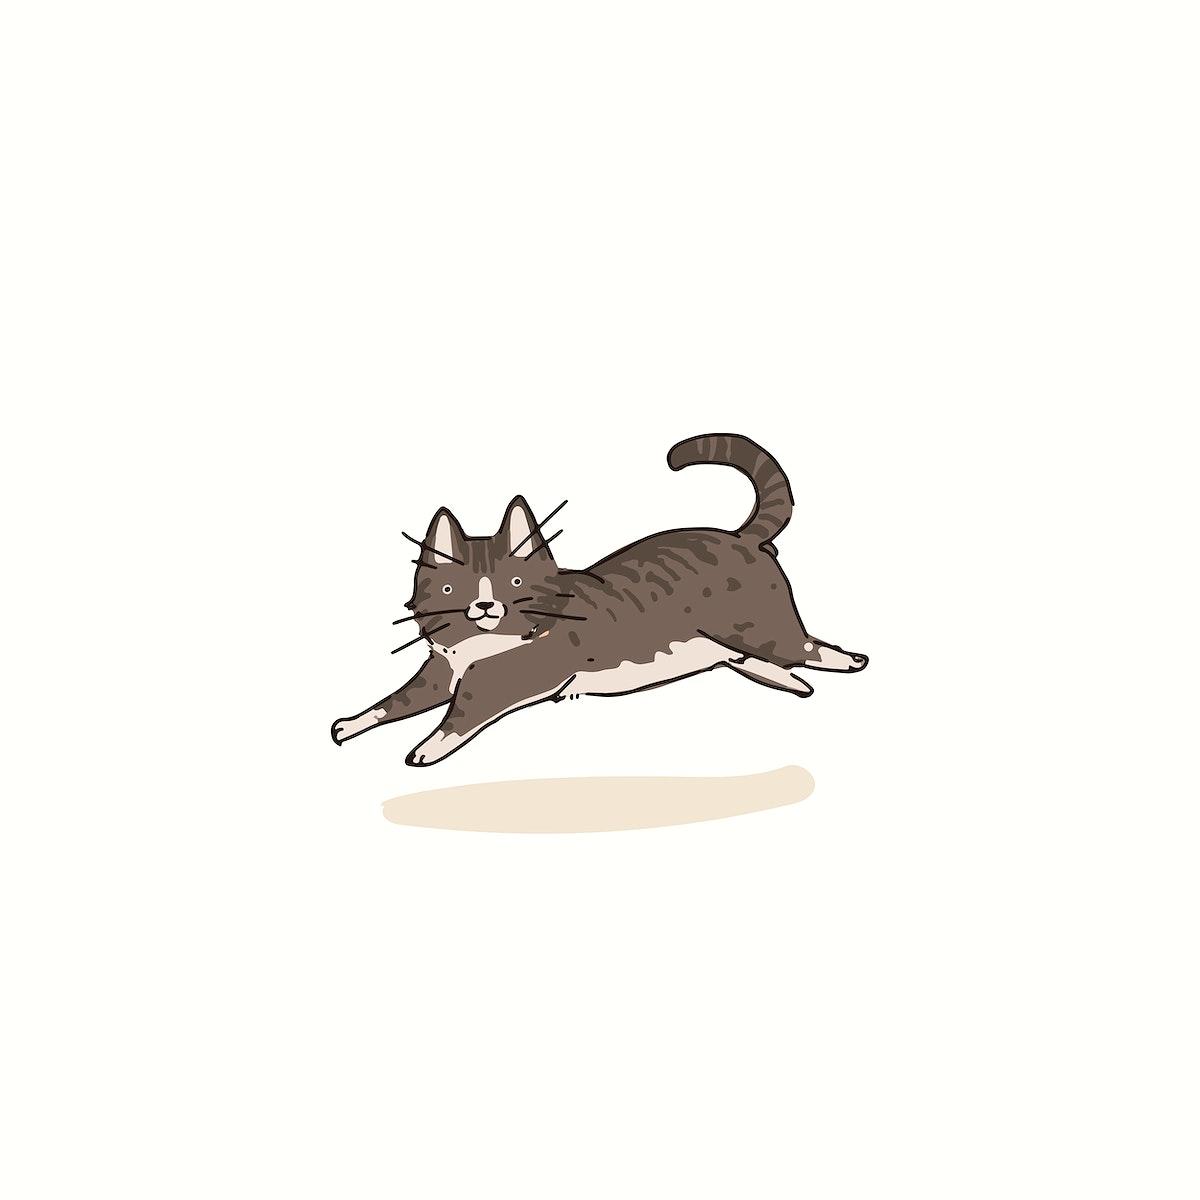 European Shorthair cat doodle element vector